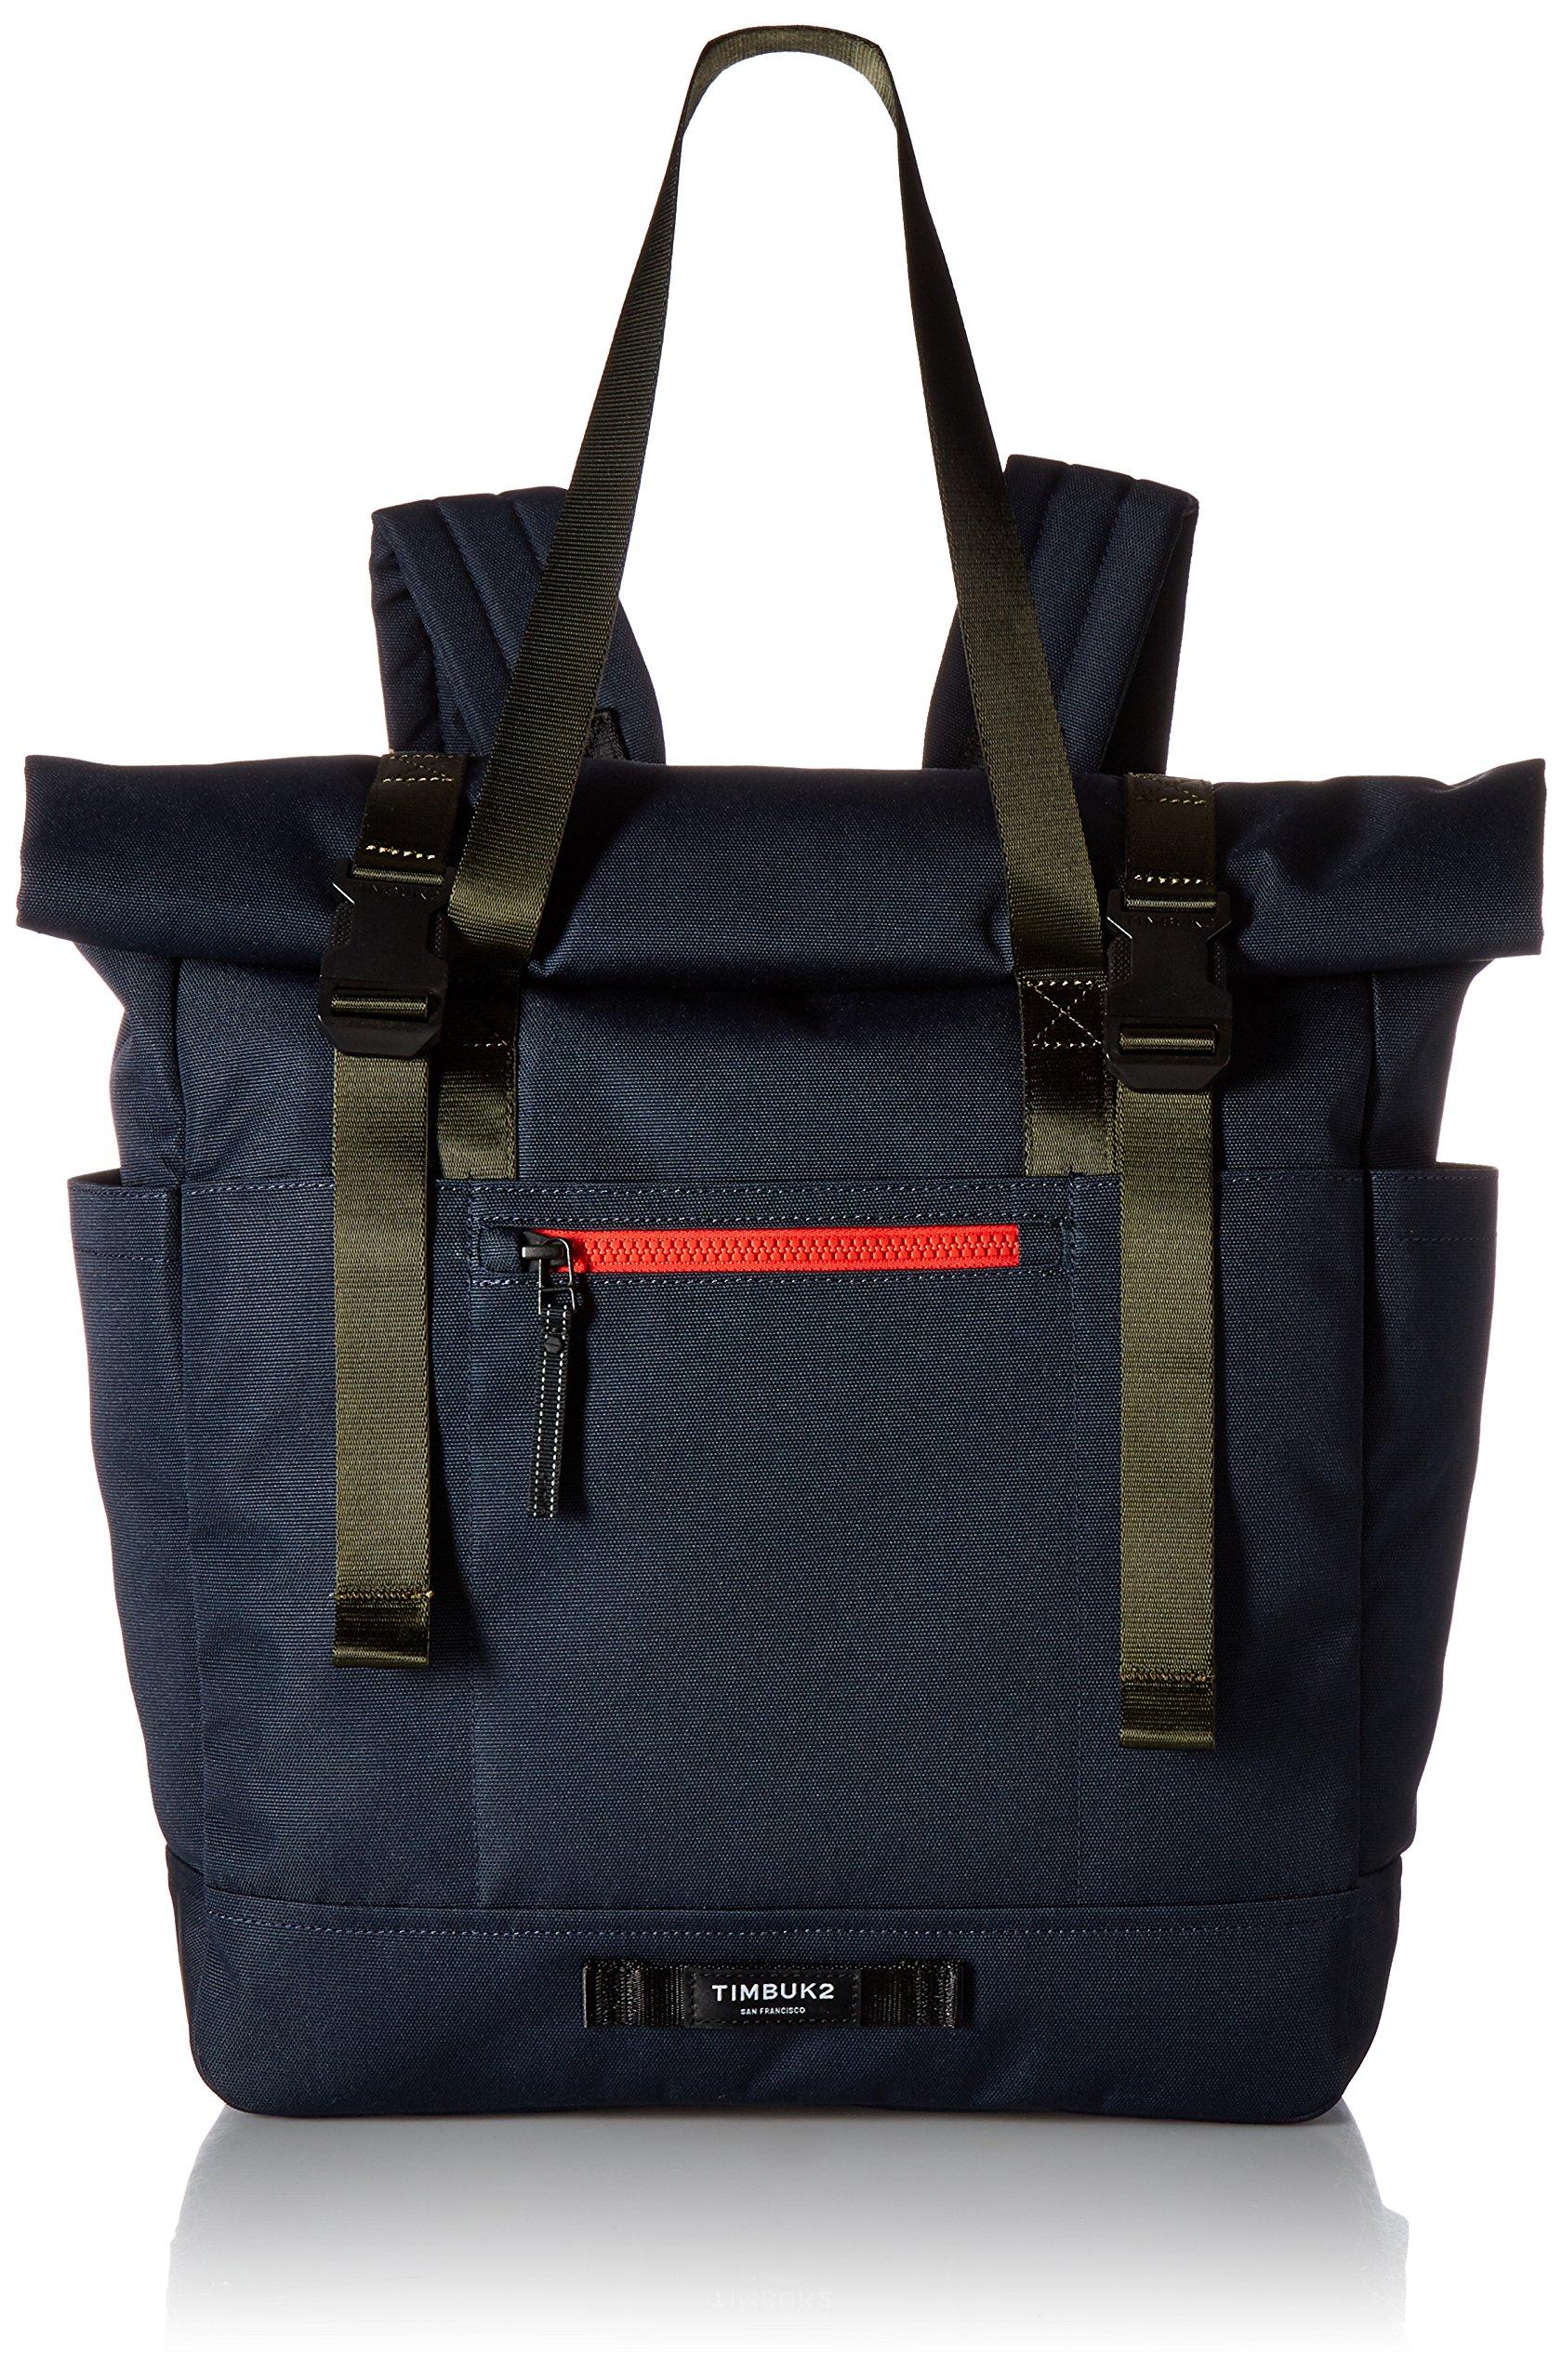 Timbuk2 Forge Tote Bag, Nautical/Bixi, One Size by Timbuk2